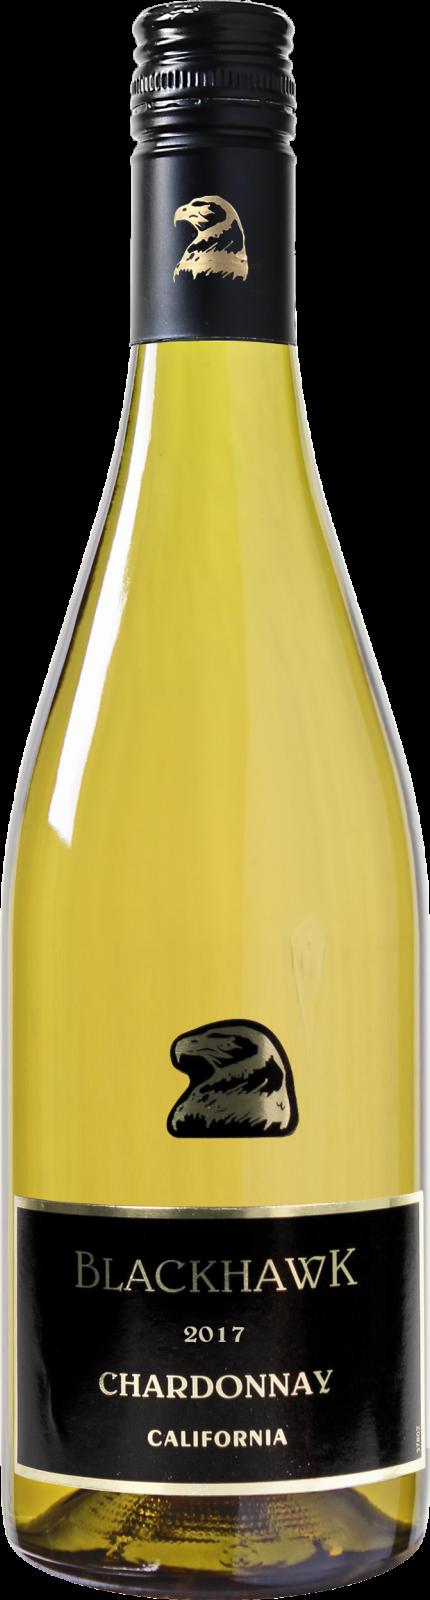 Blackhawk Chardonnay